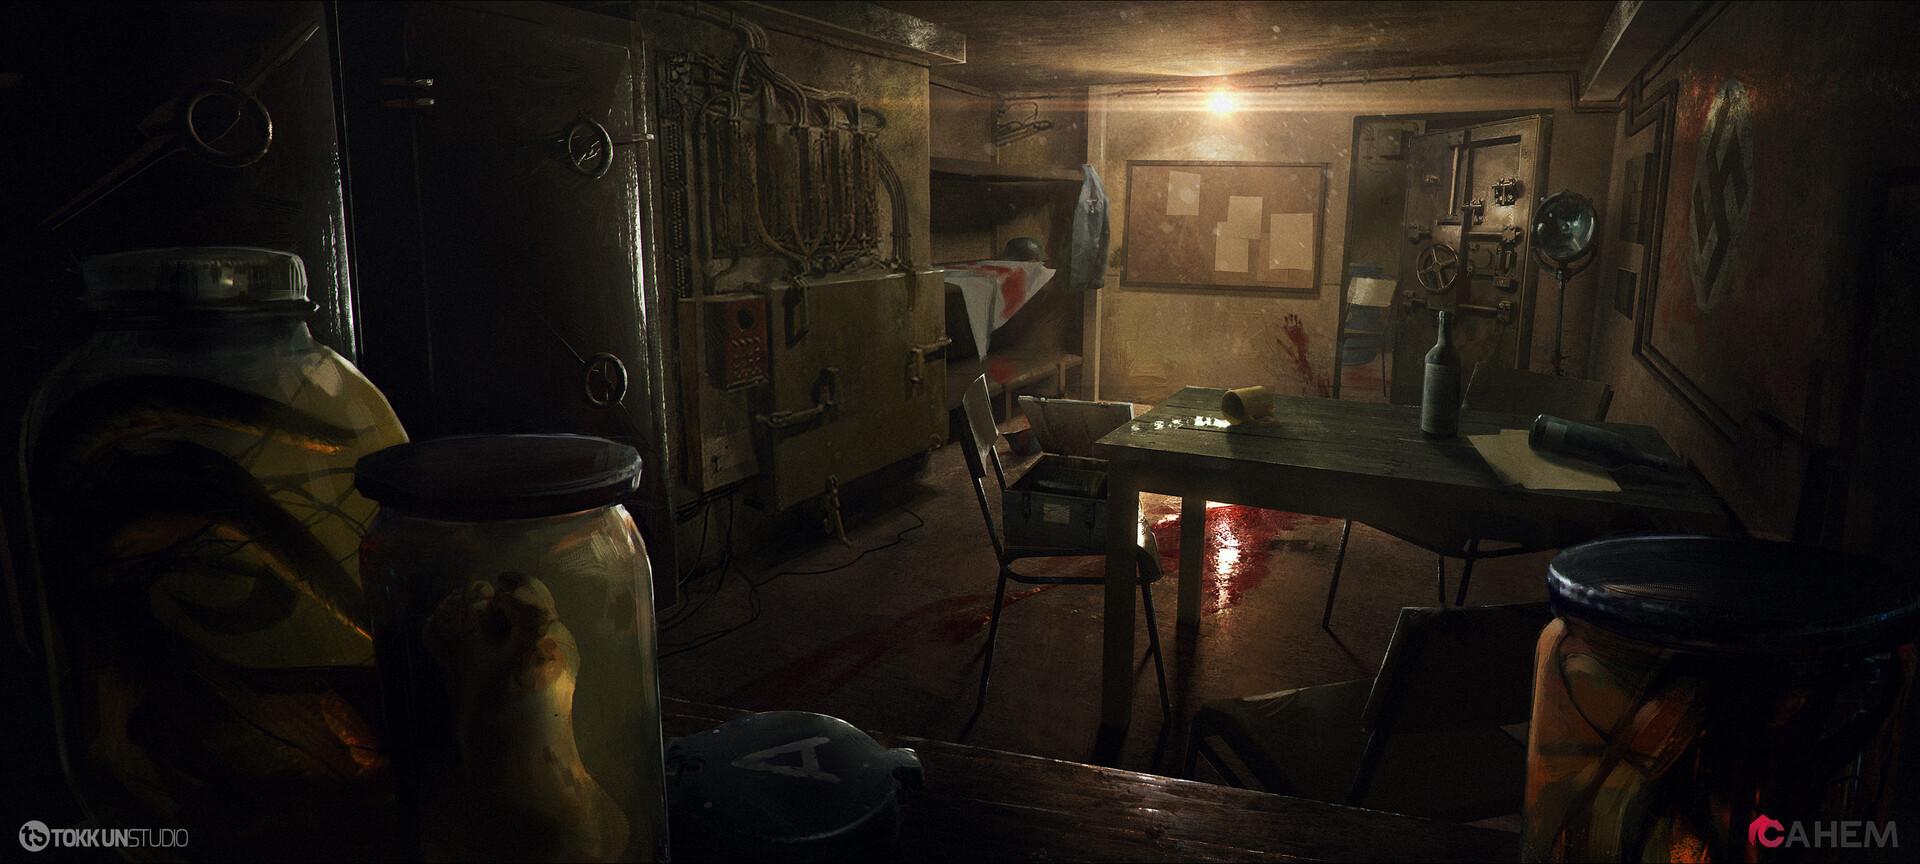 Joseph nickson joseph nickson nazi bunker concept